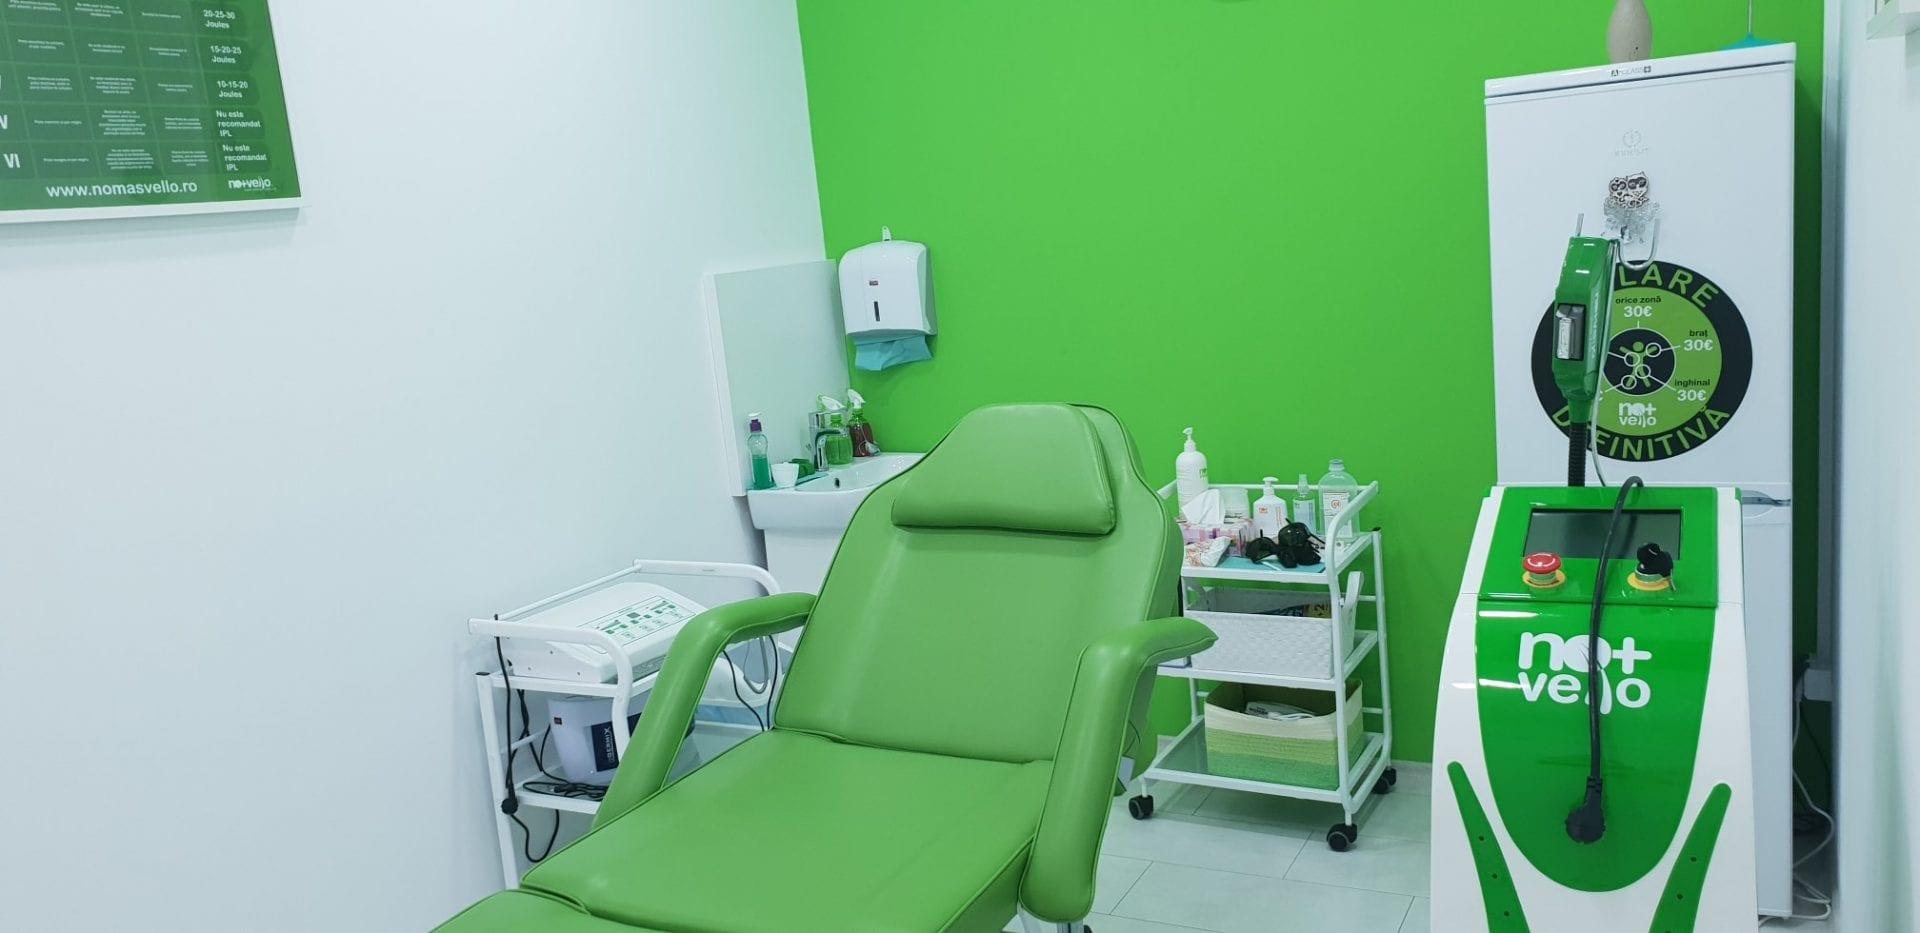 Salon Epilare Definitiva Tratamente Faciale Iasi Iullius Mall 1